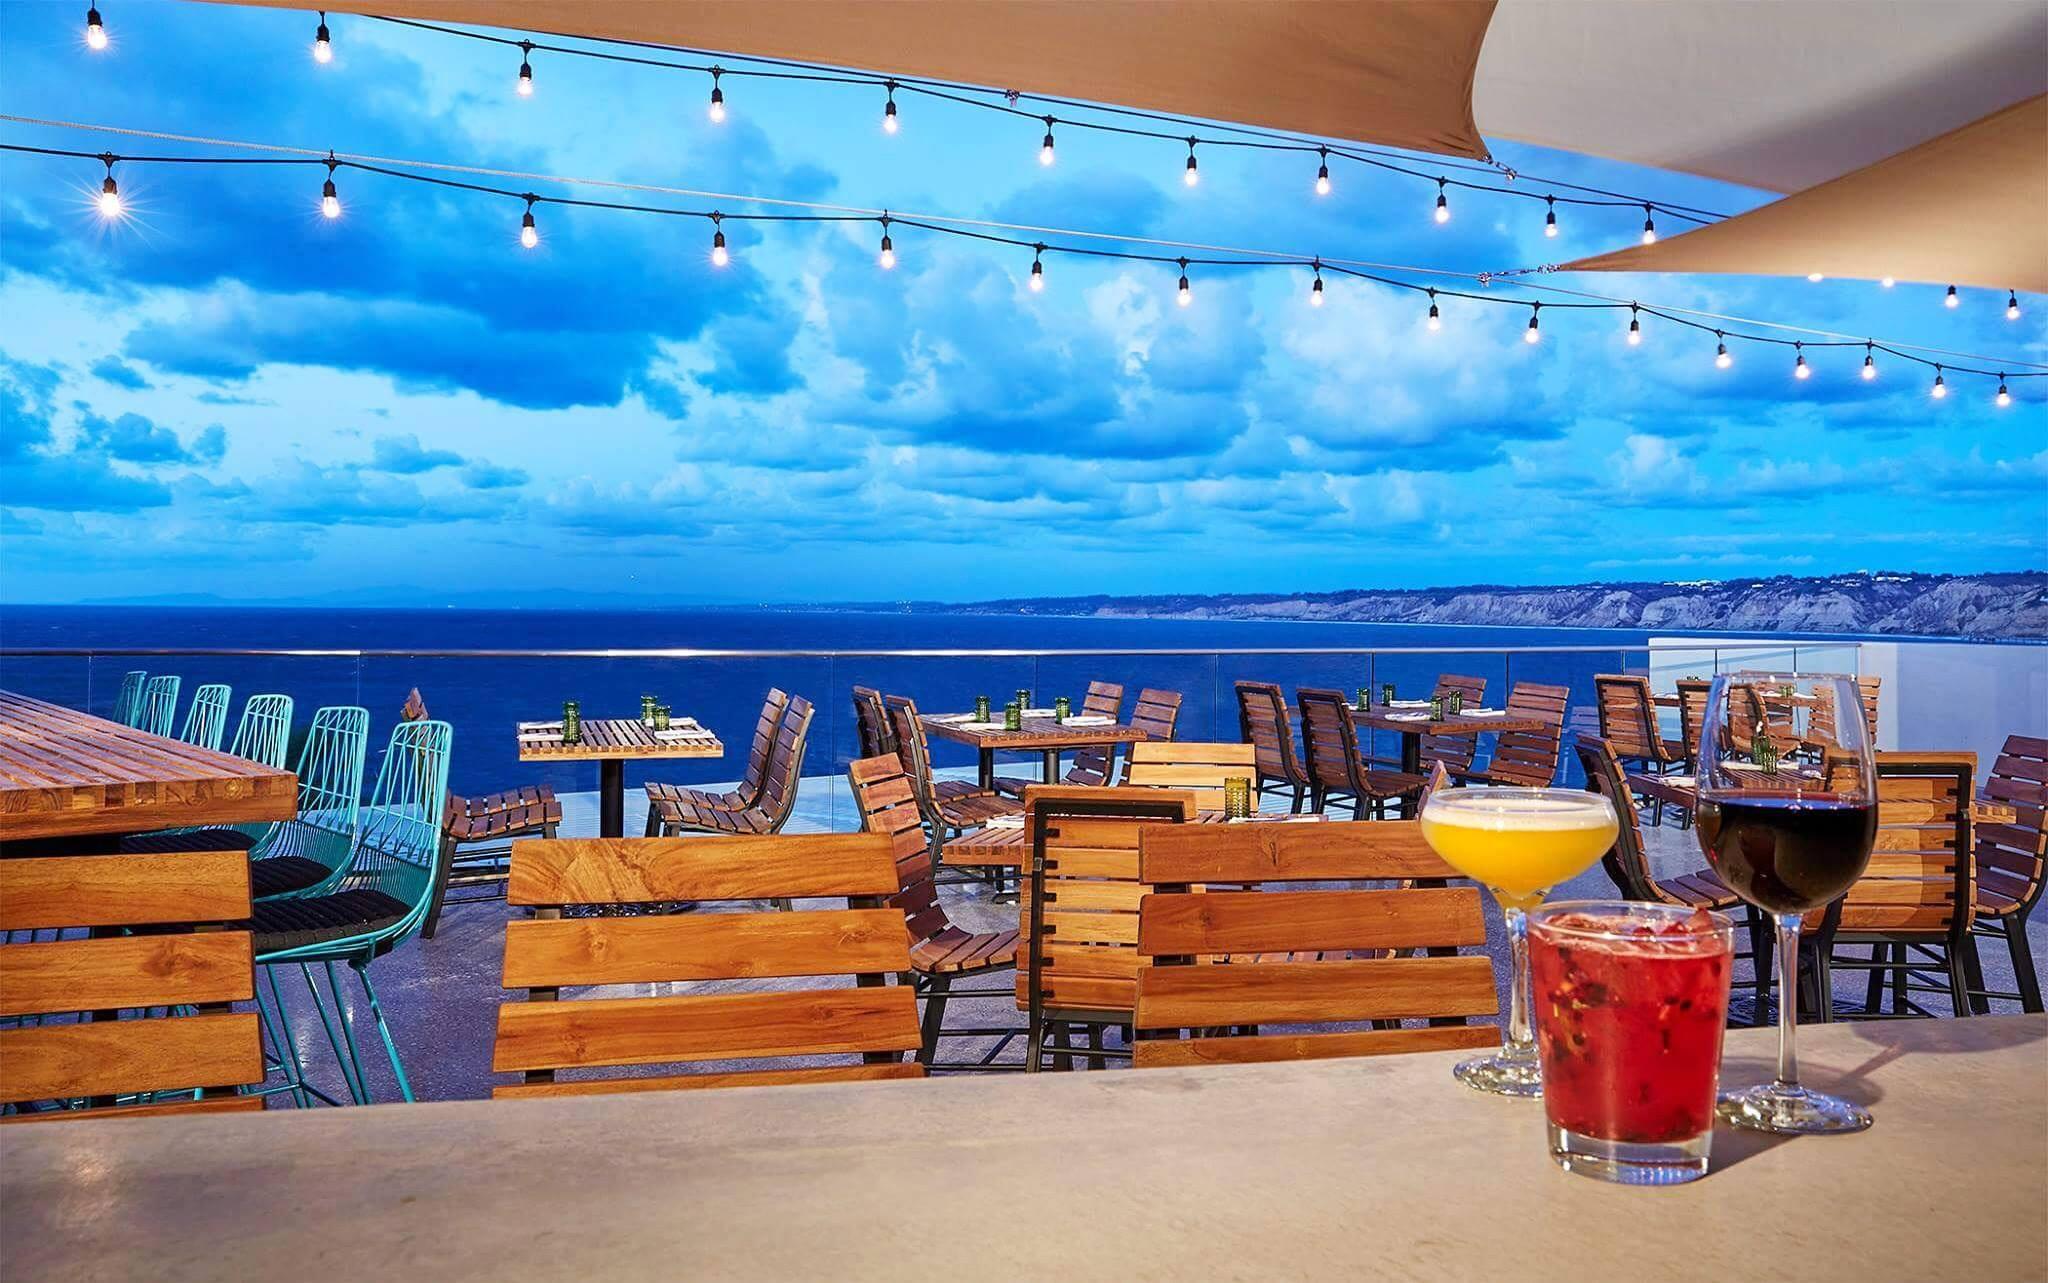 La Jolla Dinner  Best Romantic Restaurants in La Jolla